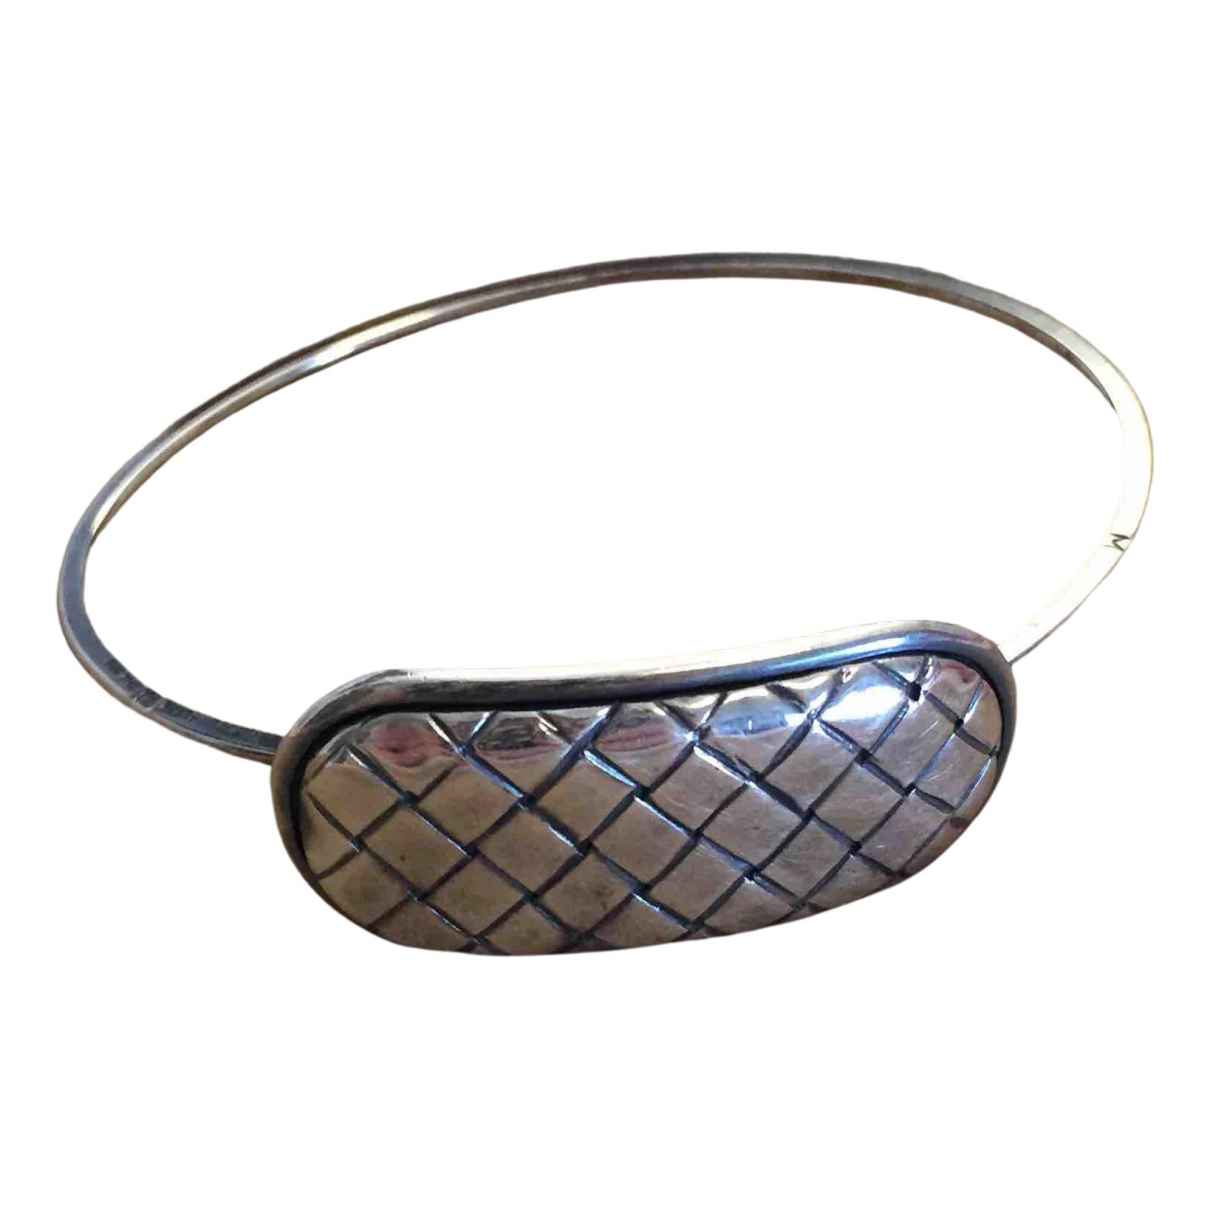 Bottega Veneta - Bracelet   pour femme en argent - argente